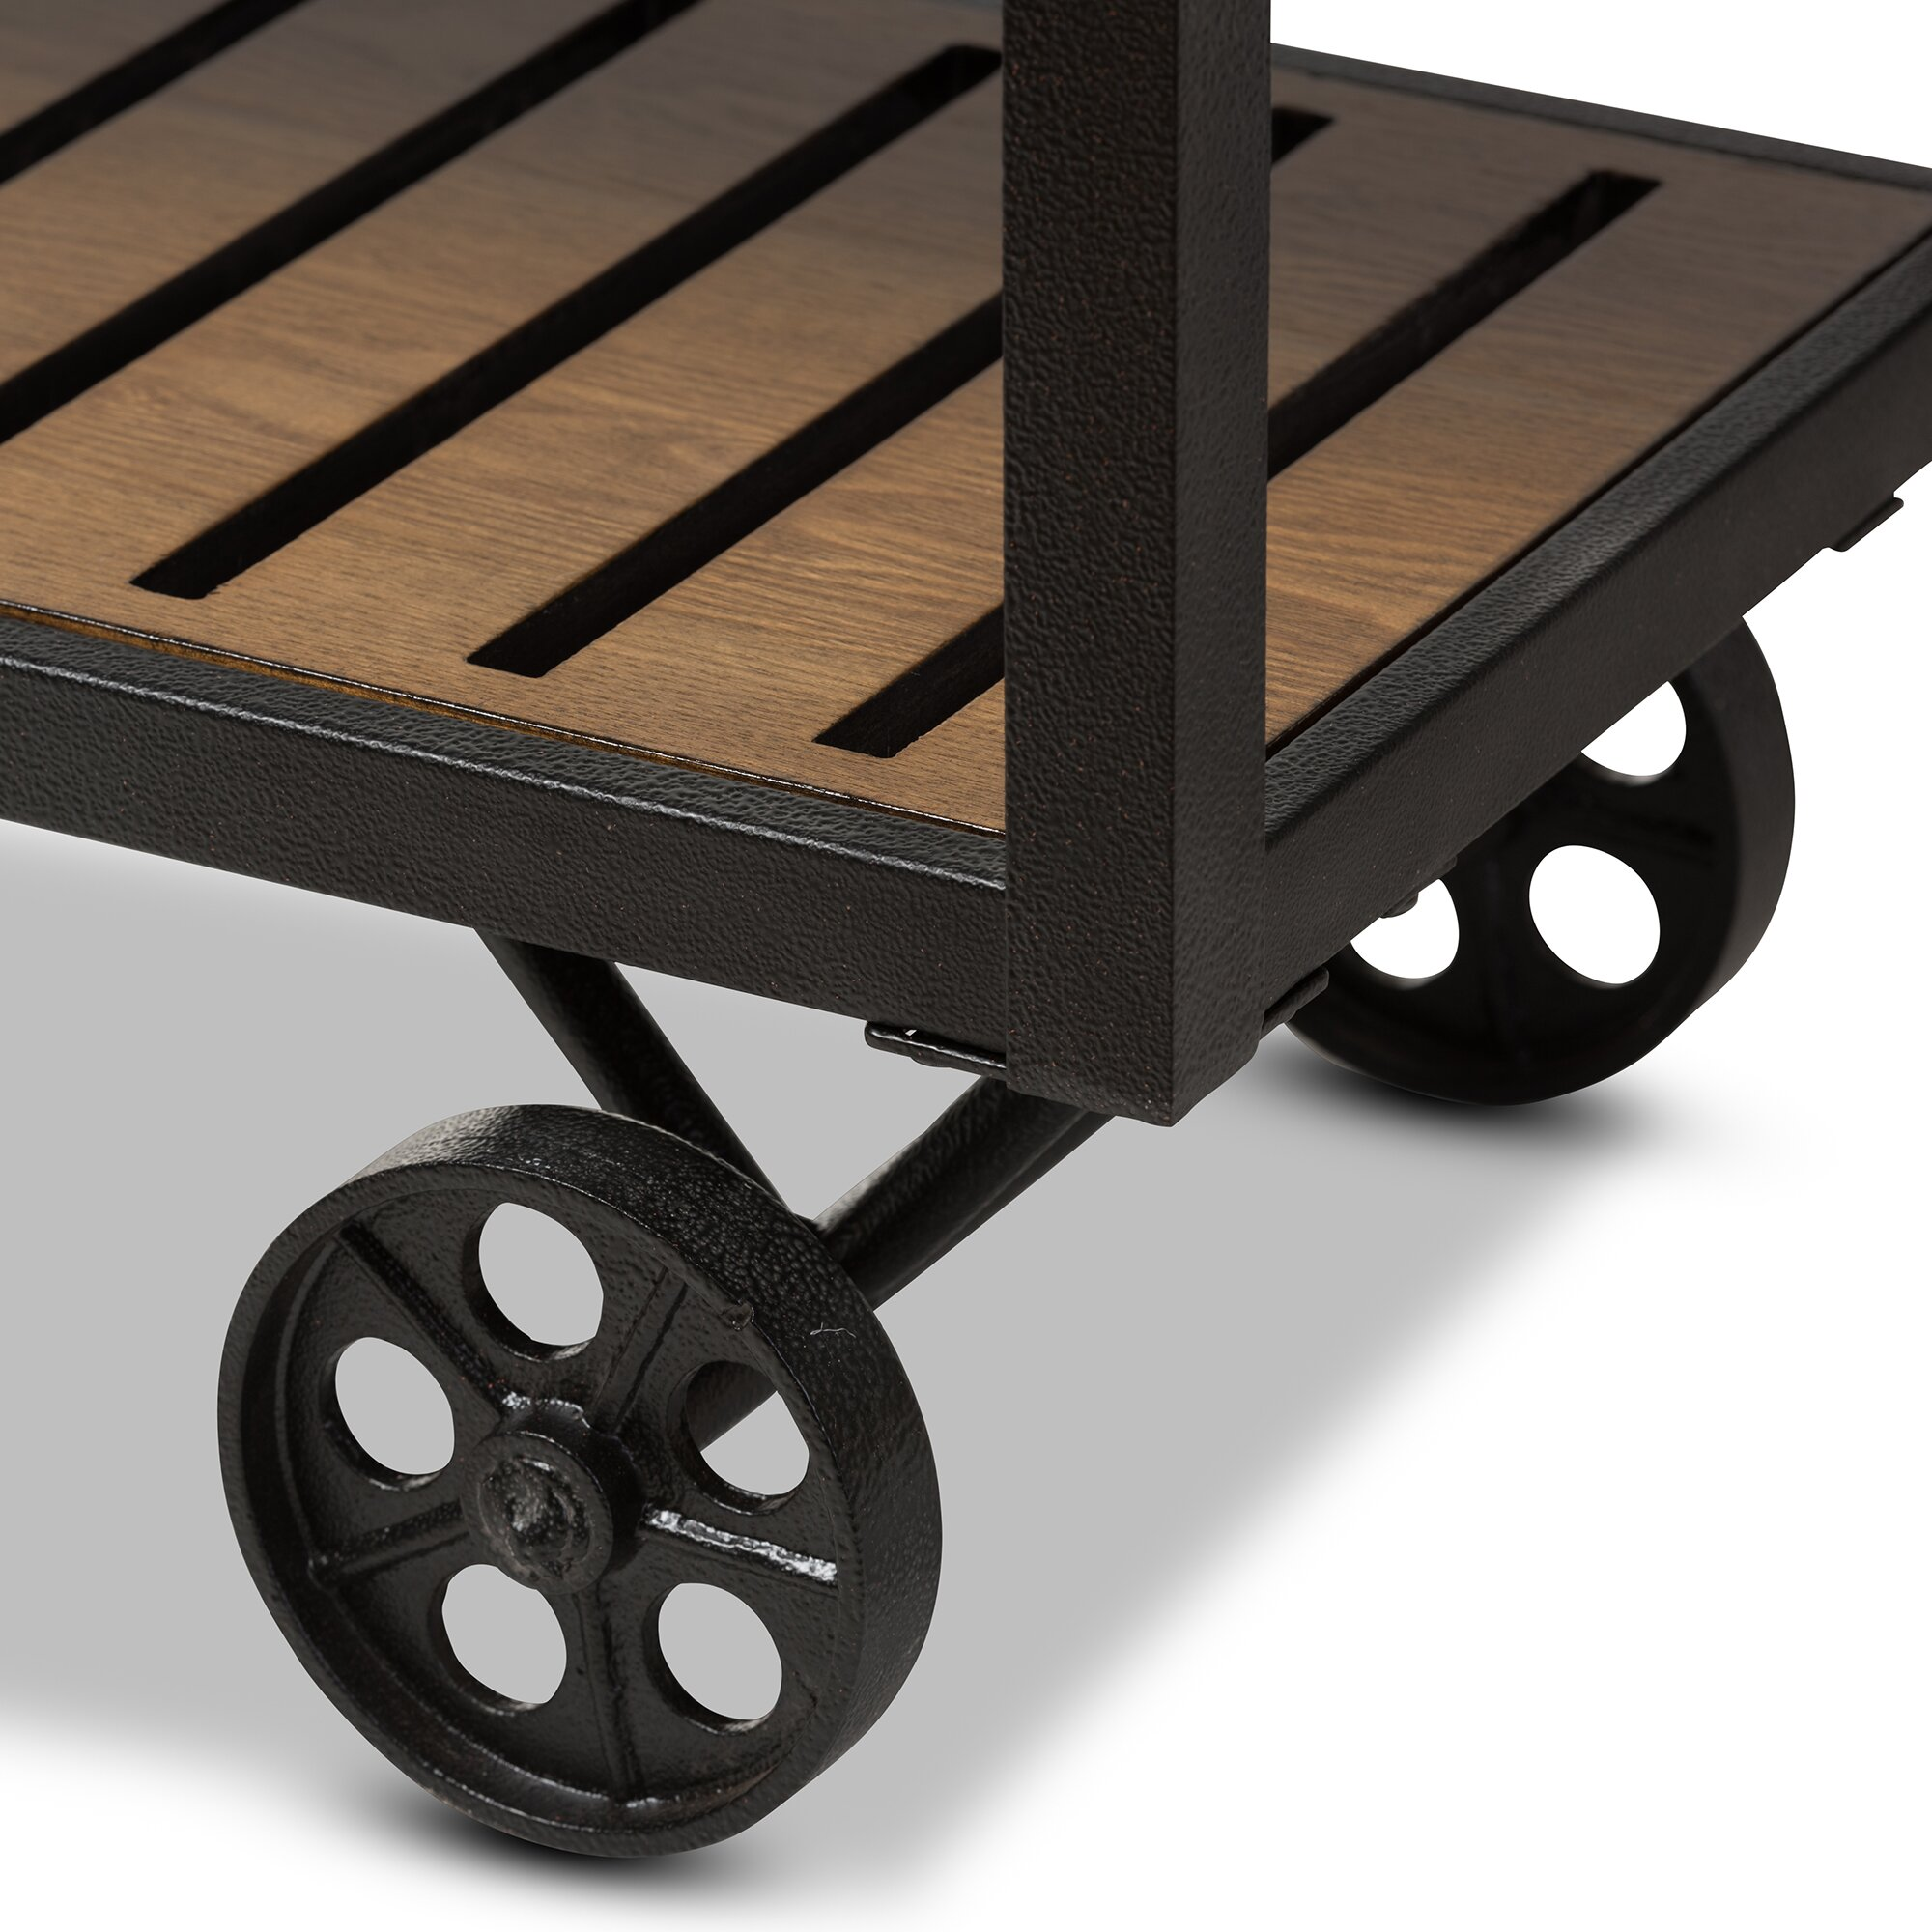 Wholesale Interiors Bradford Serving Cart Reviews: Wholesale Interiors Baxton Studio Kennedy Serving Cart